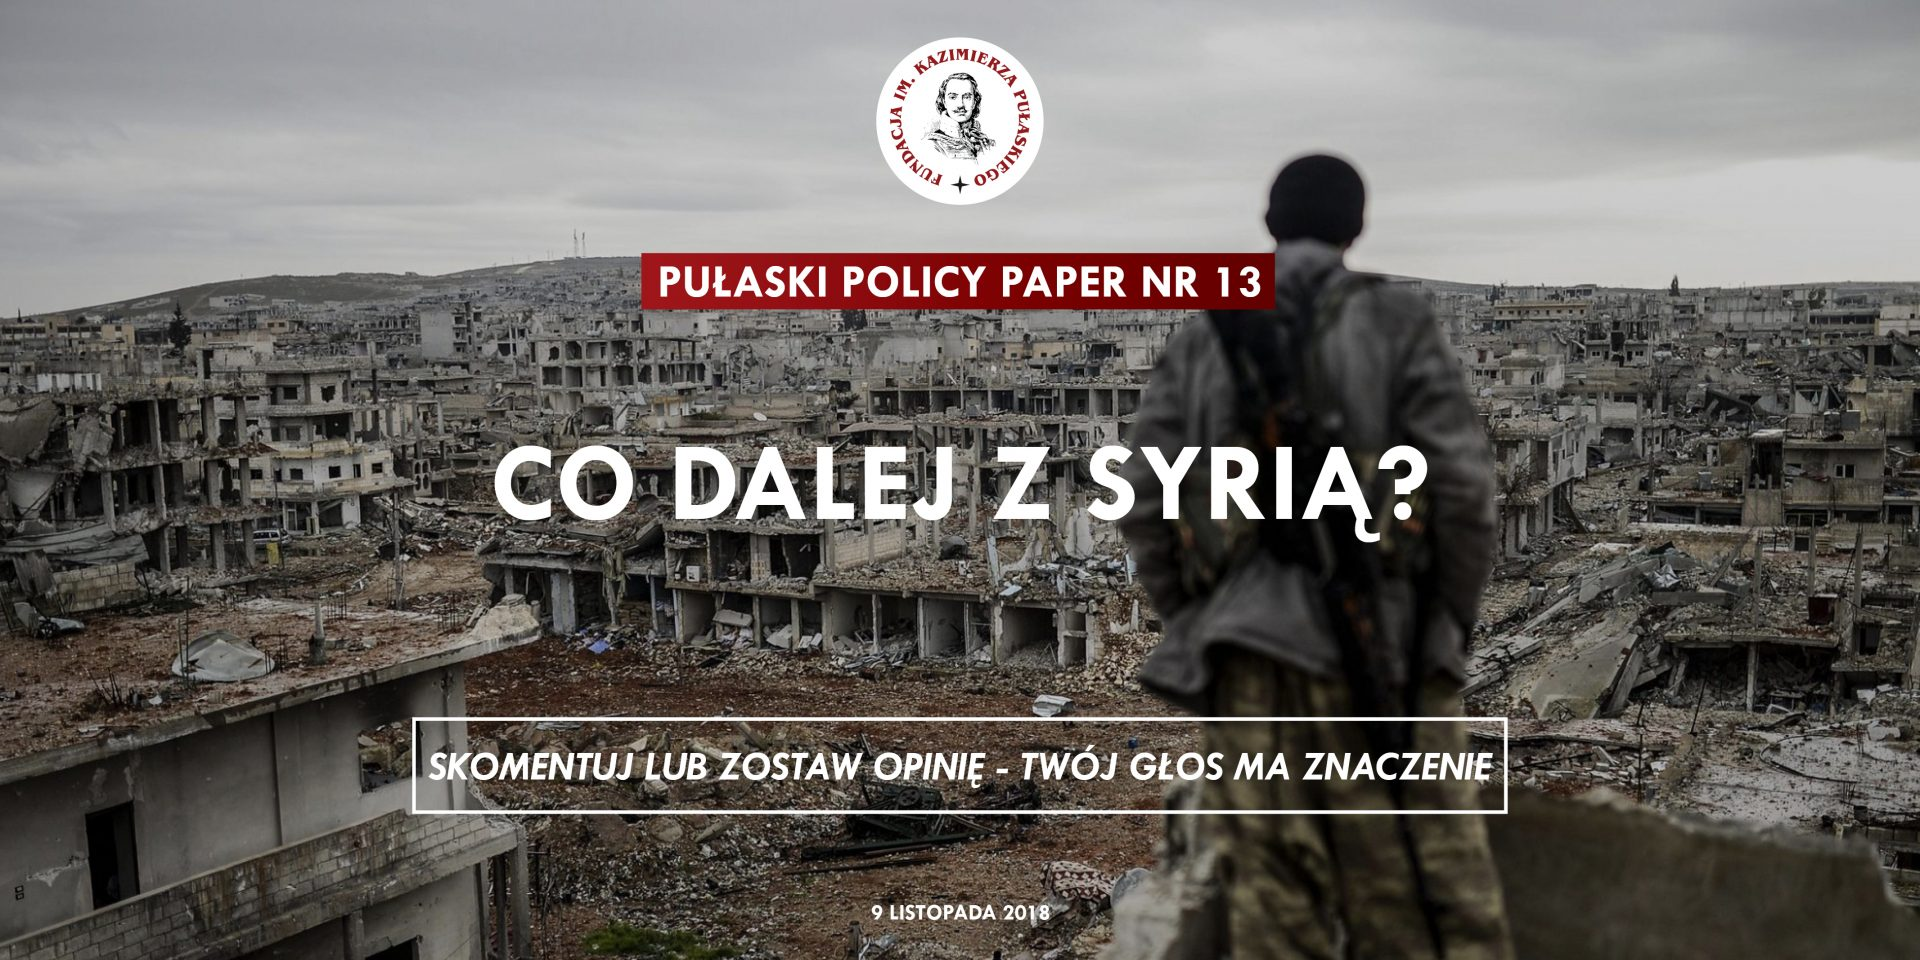 PULASKI POLICY PAPER – T. Otłowski: What's next for Syria?